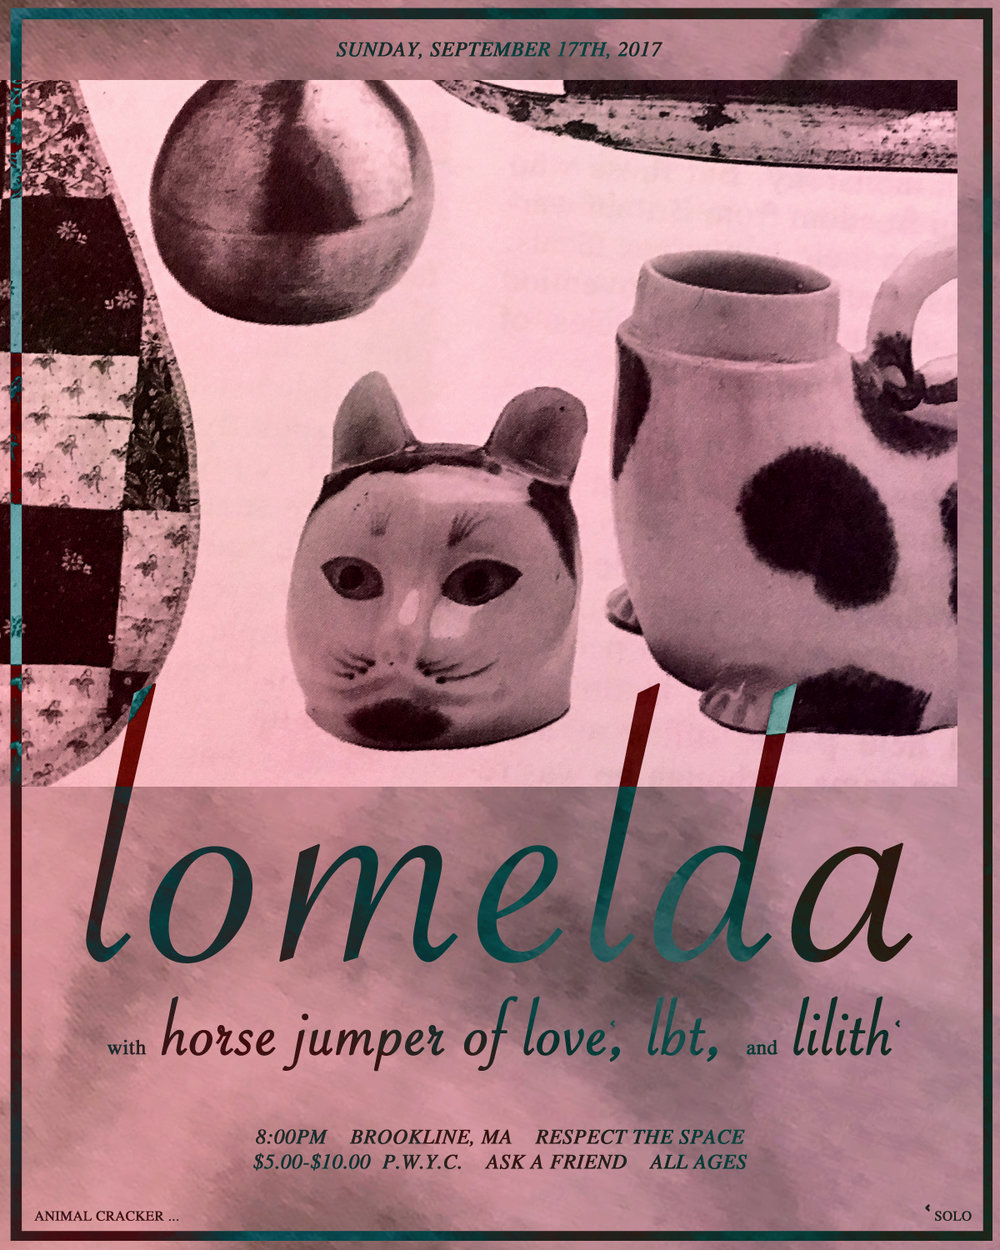 Flyer-Lomelda9170-FixedDate copy.jpg